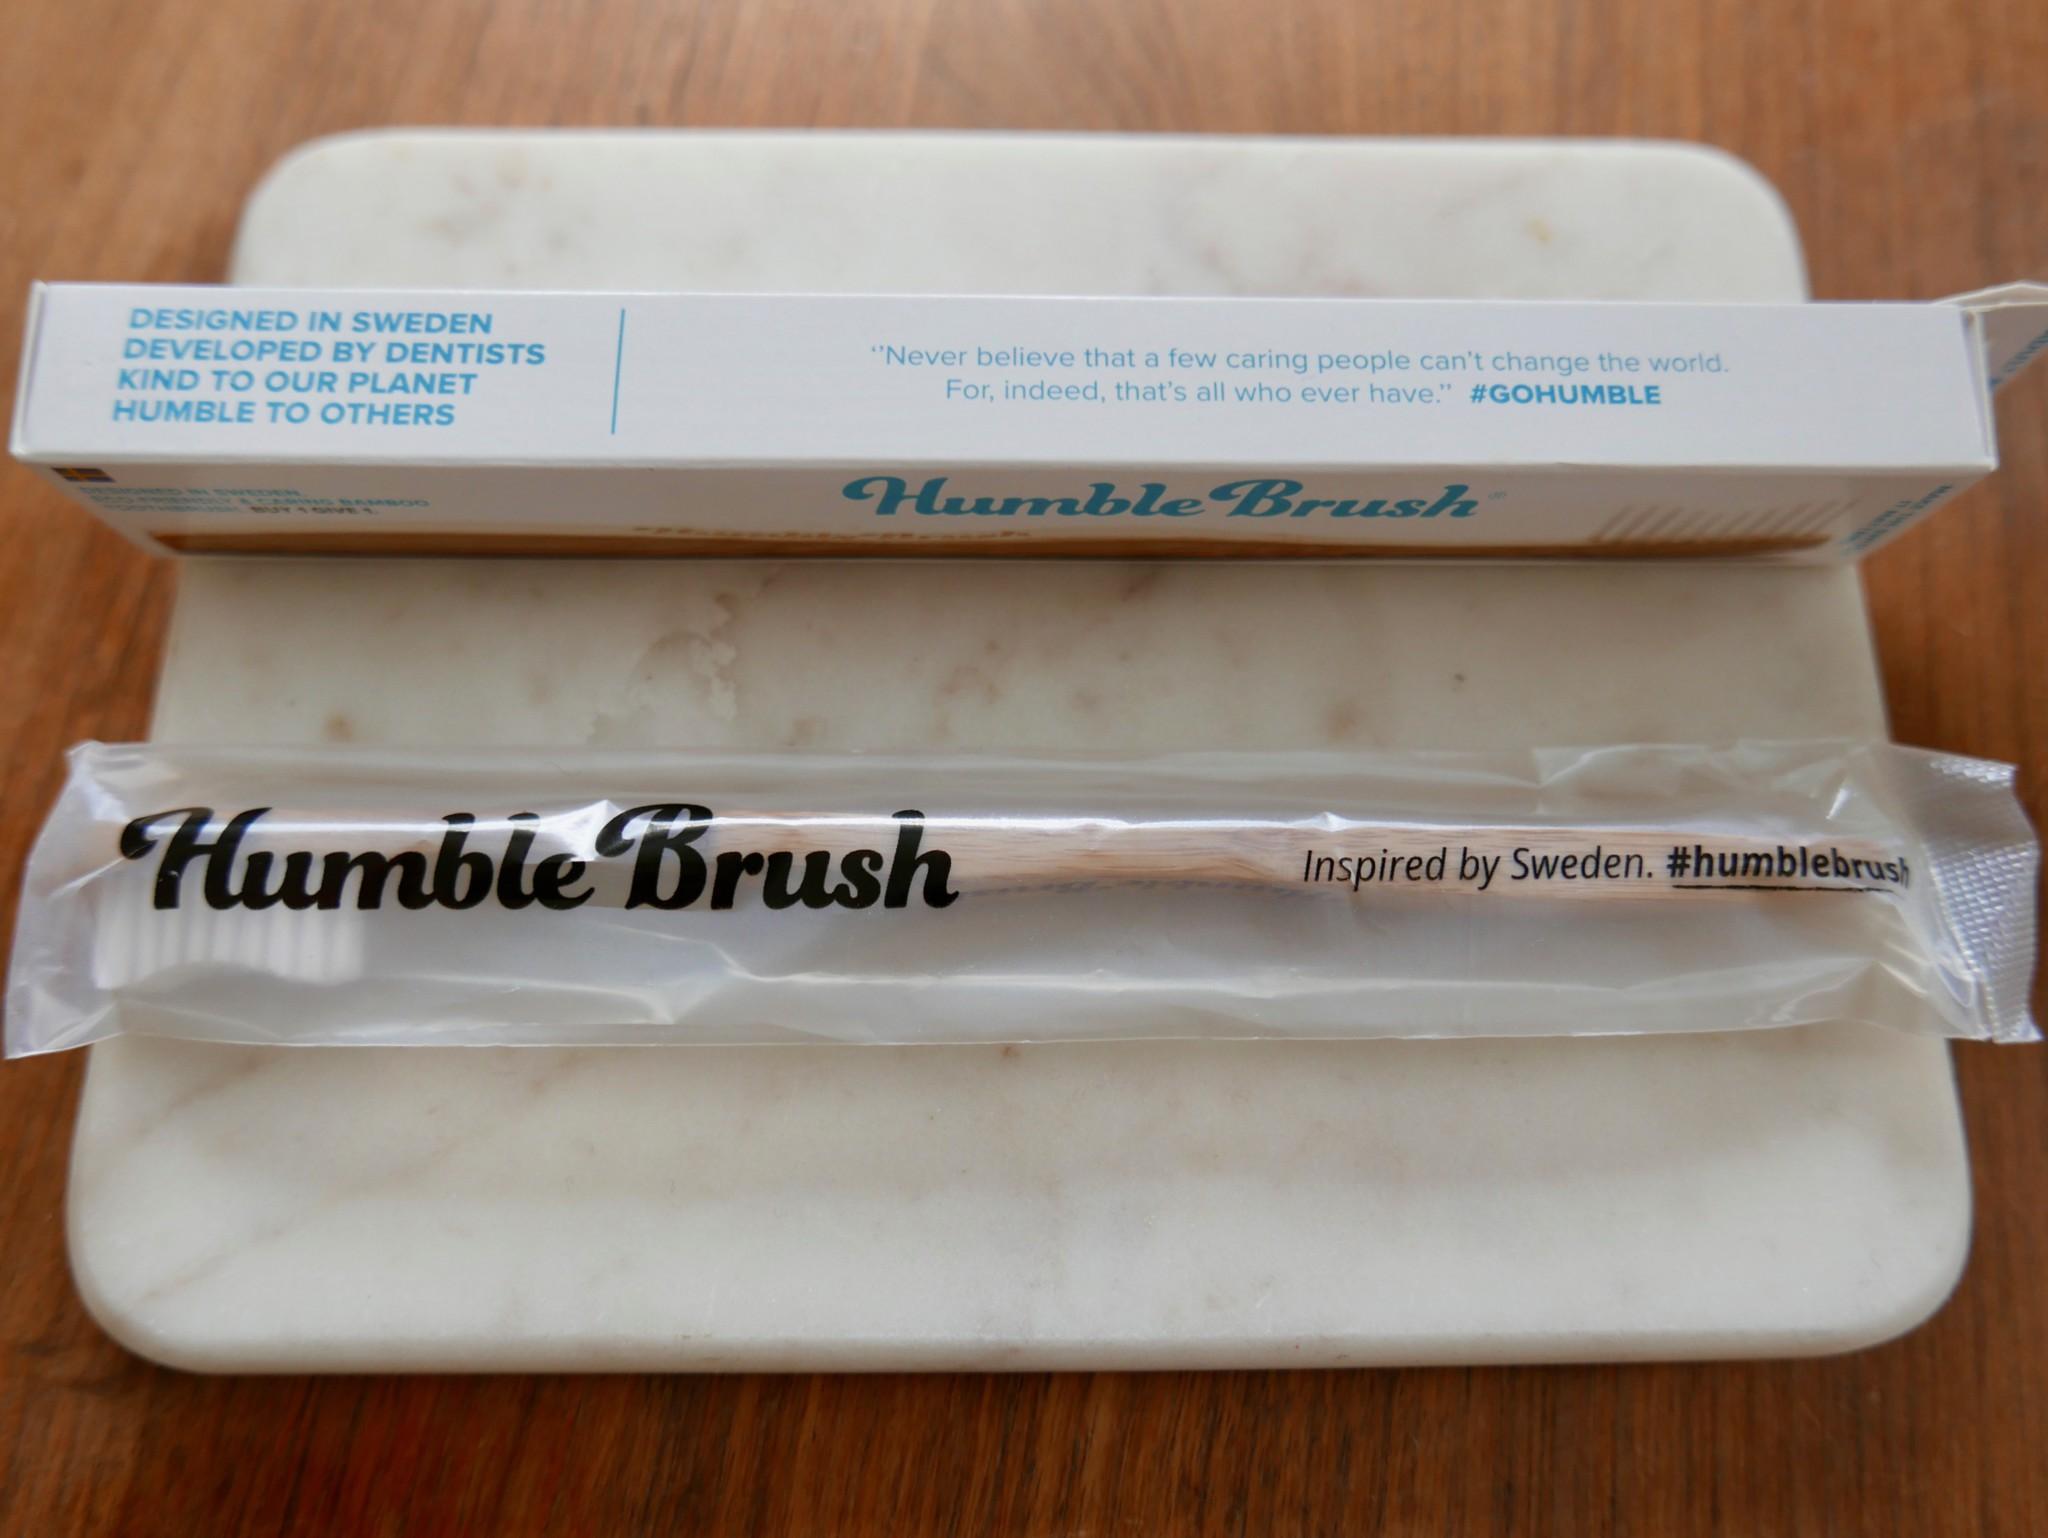 humble-brush-sweden-bambus-anja-stang